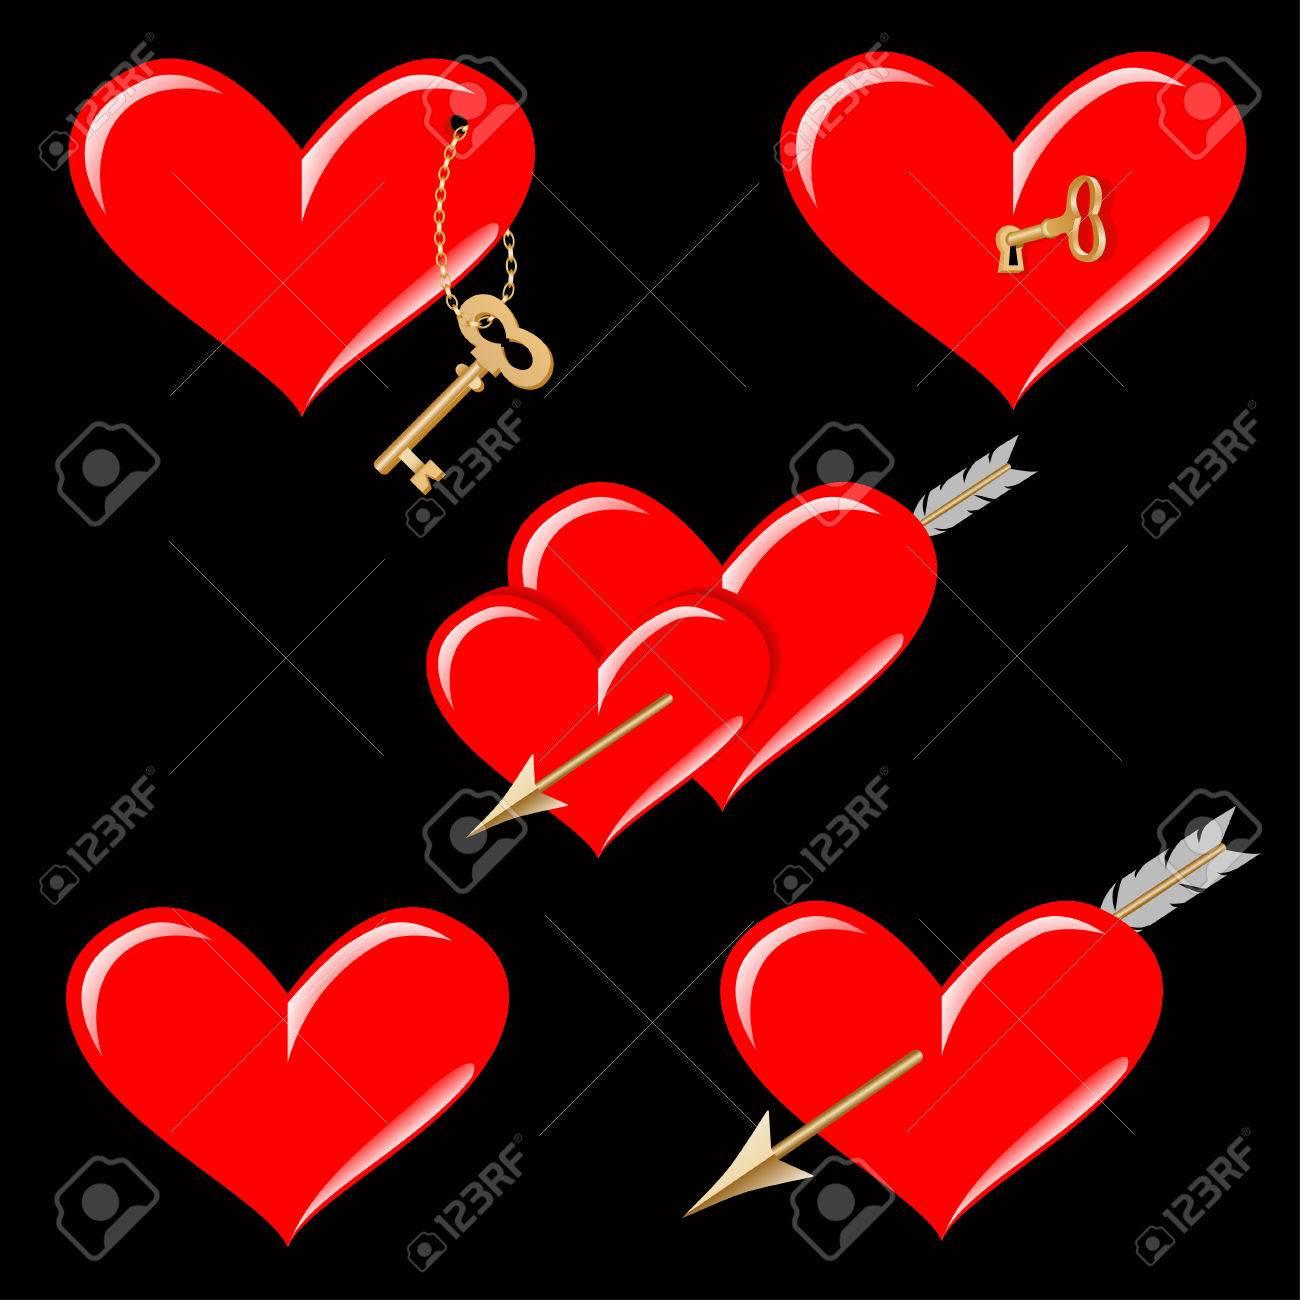 Hearts icons heart symbols of st valentine royalty free heart symbols of st valentine stock vector 52359348 biocorpaavc